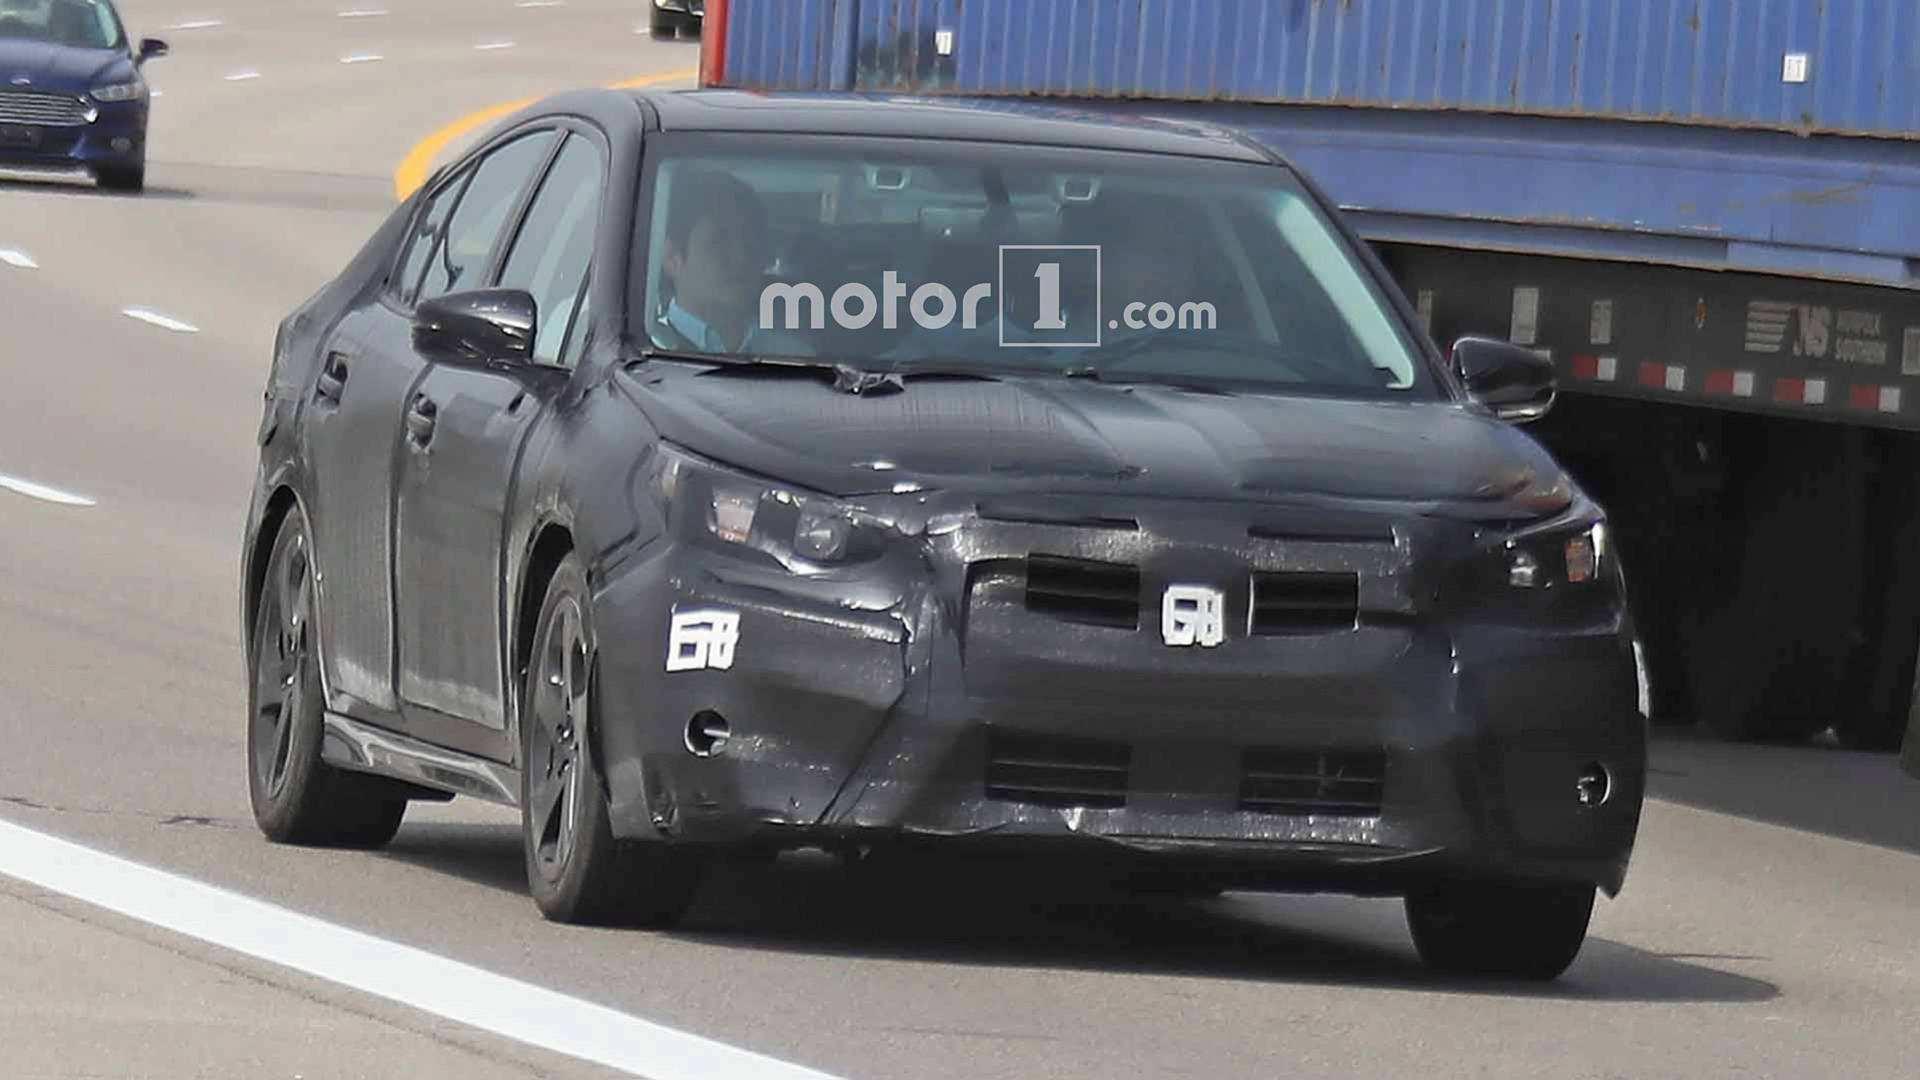 62 All New Subaru Eyesight 2020 Exterior with Subaru Eyesight 2020